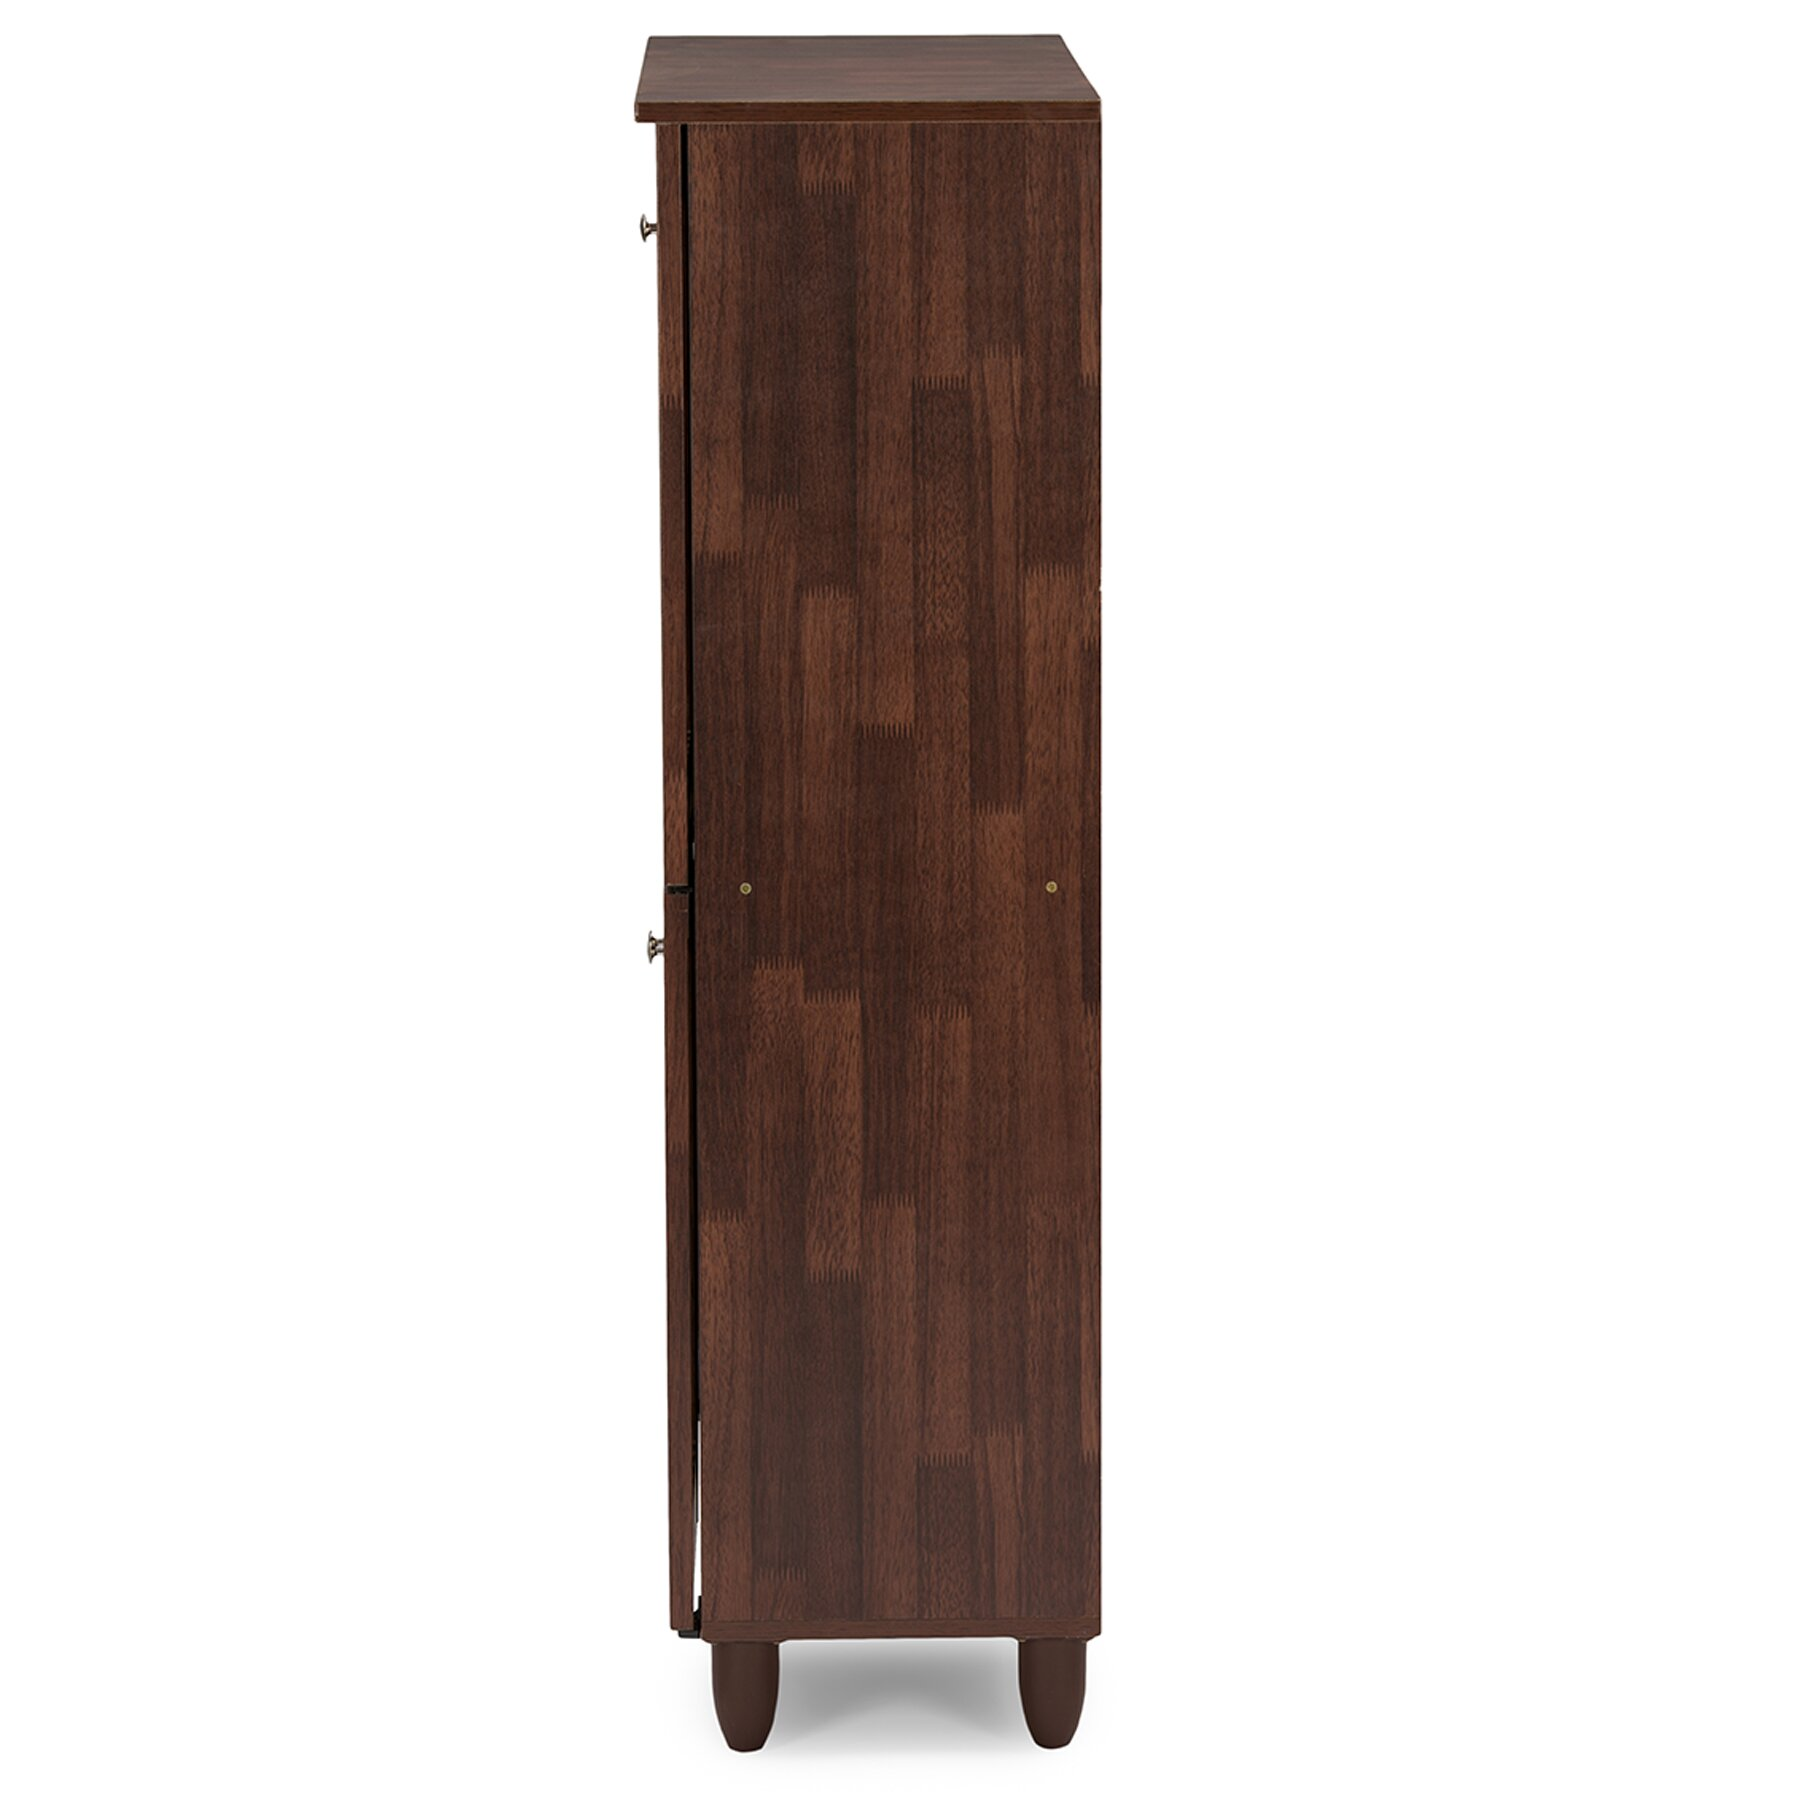 Foyer Cabinet Tall : Wholesale interiors baxton studio fernanda door entryway